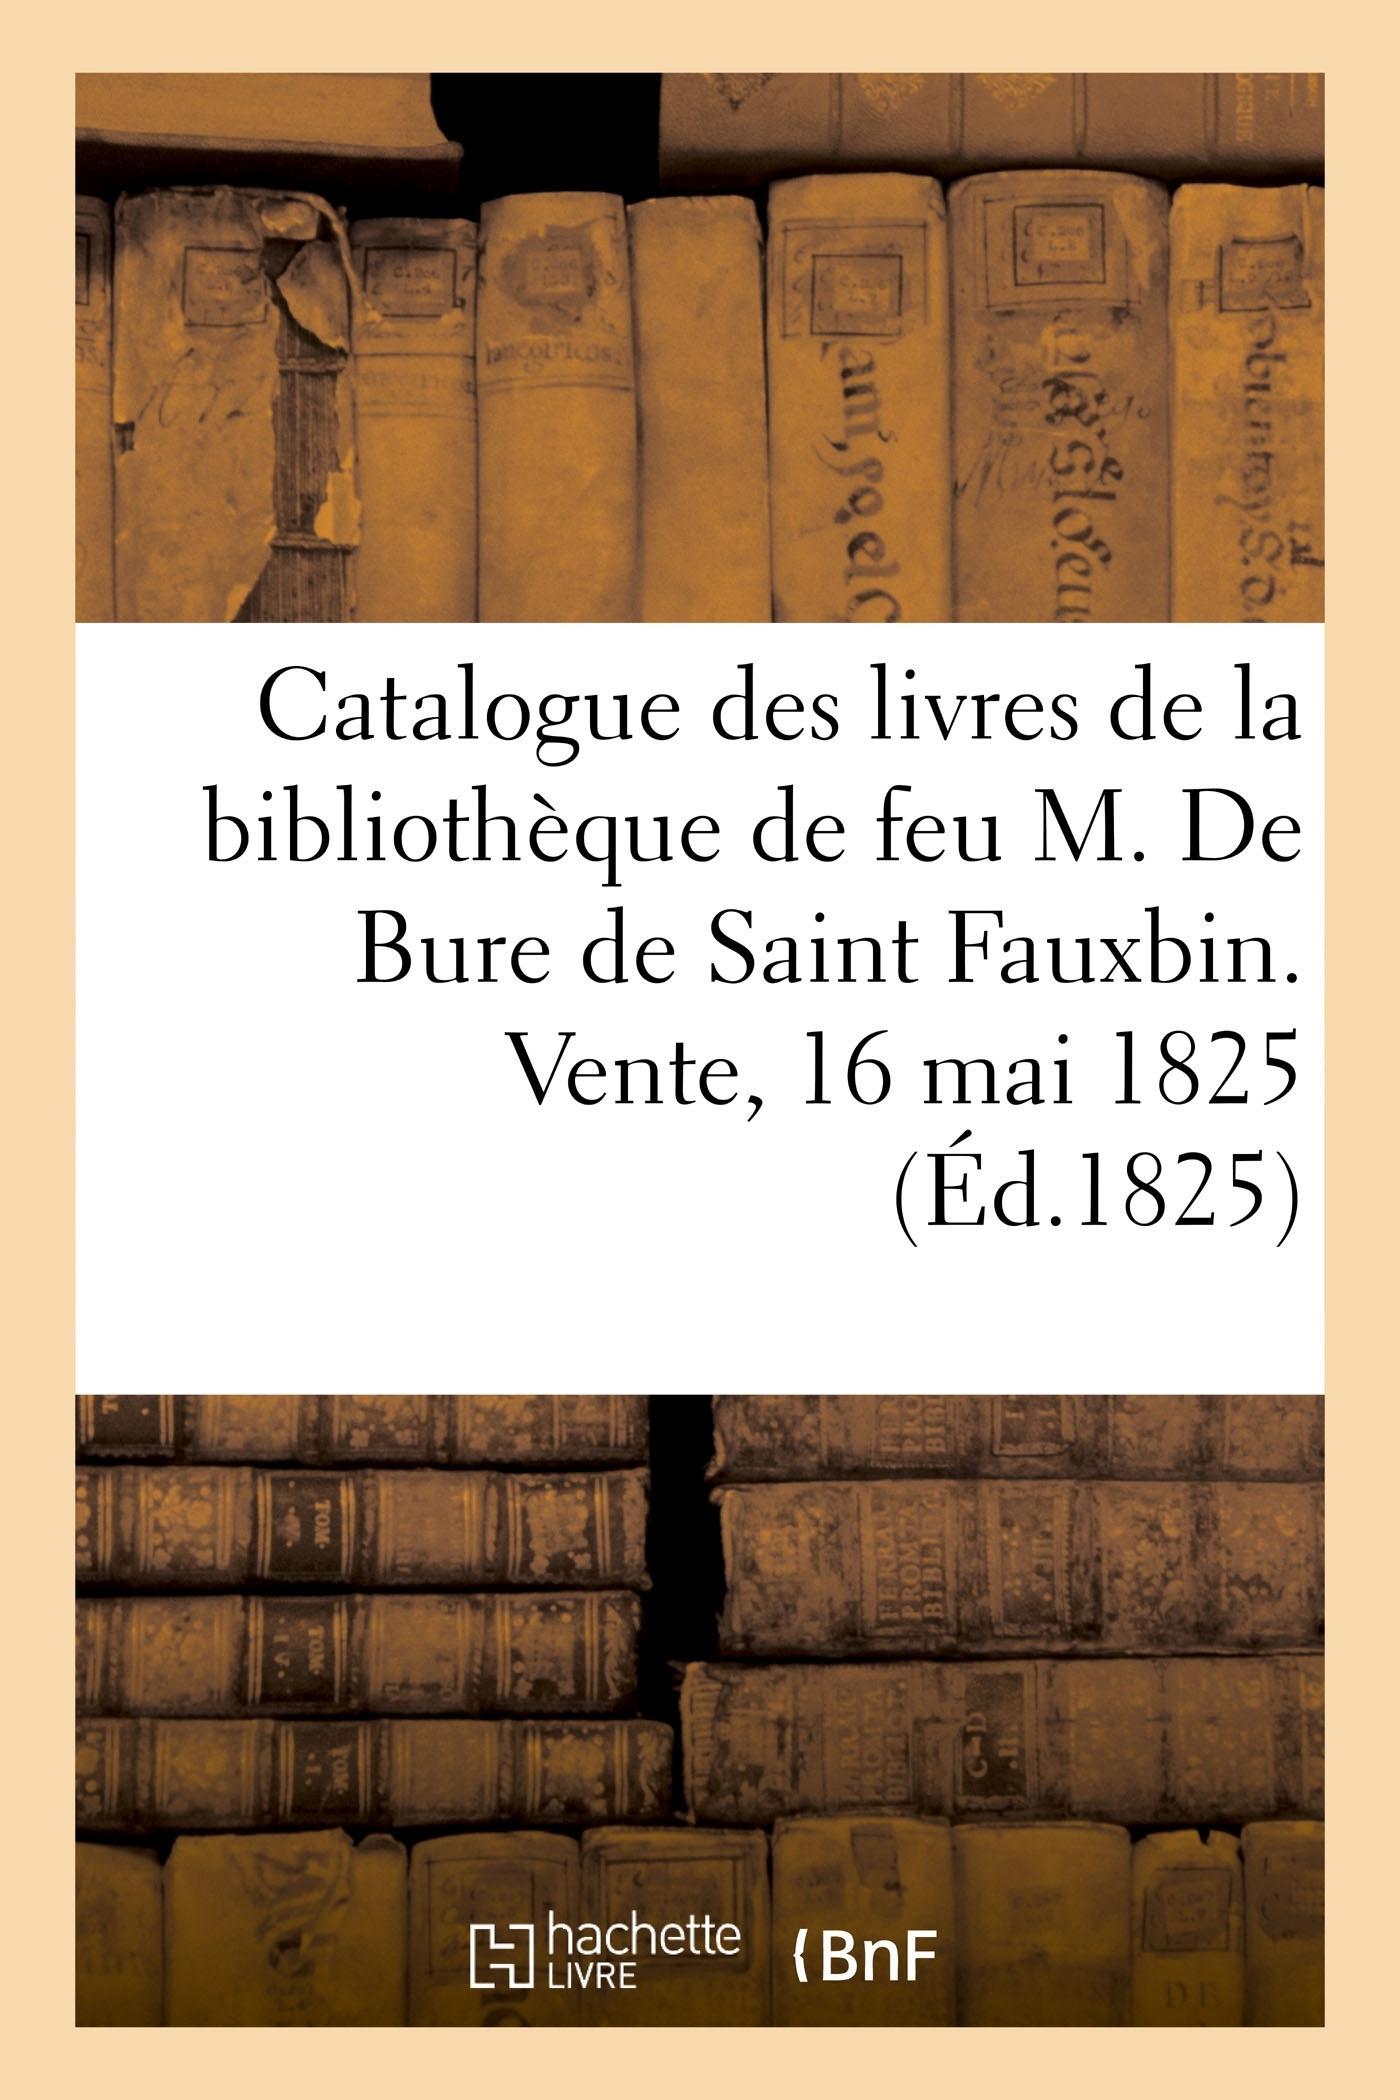 CATALOGUE DES LIVRES DE LA BIBLIOTHEQUE DE FEU M. DE BURE DE SAINT FAUXBIN. VENTE, 16 MAI 1825